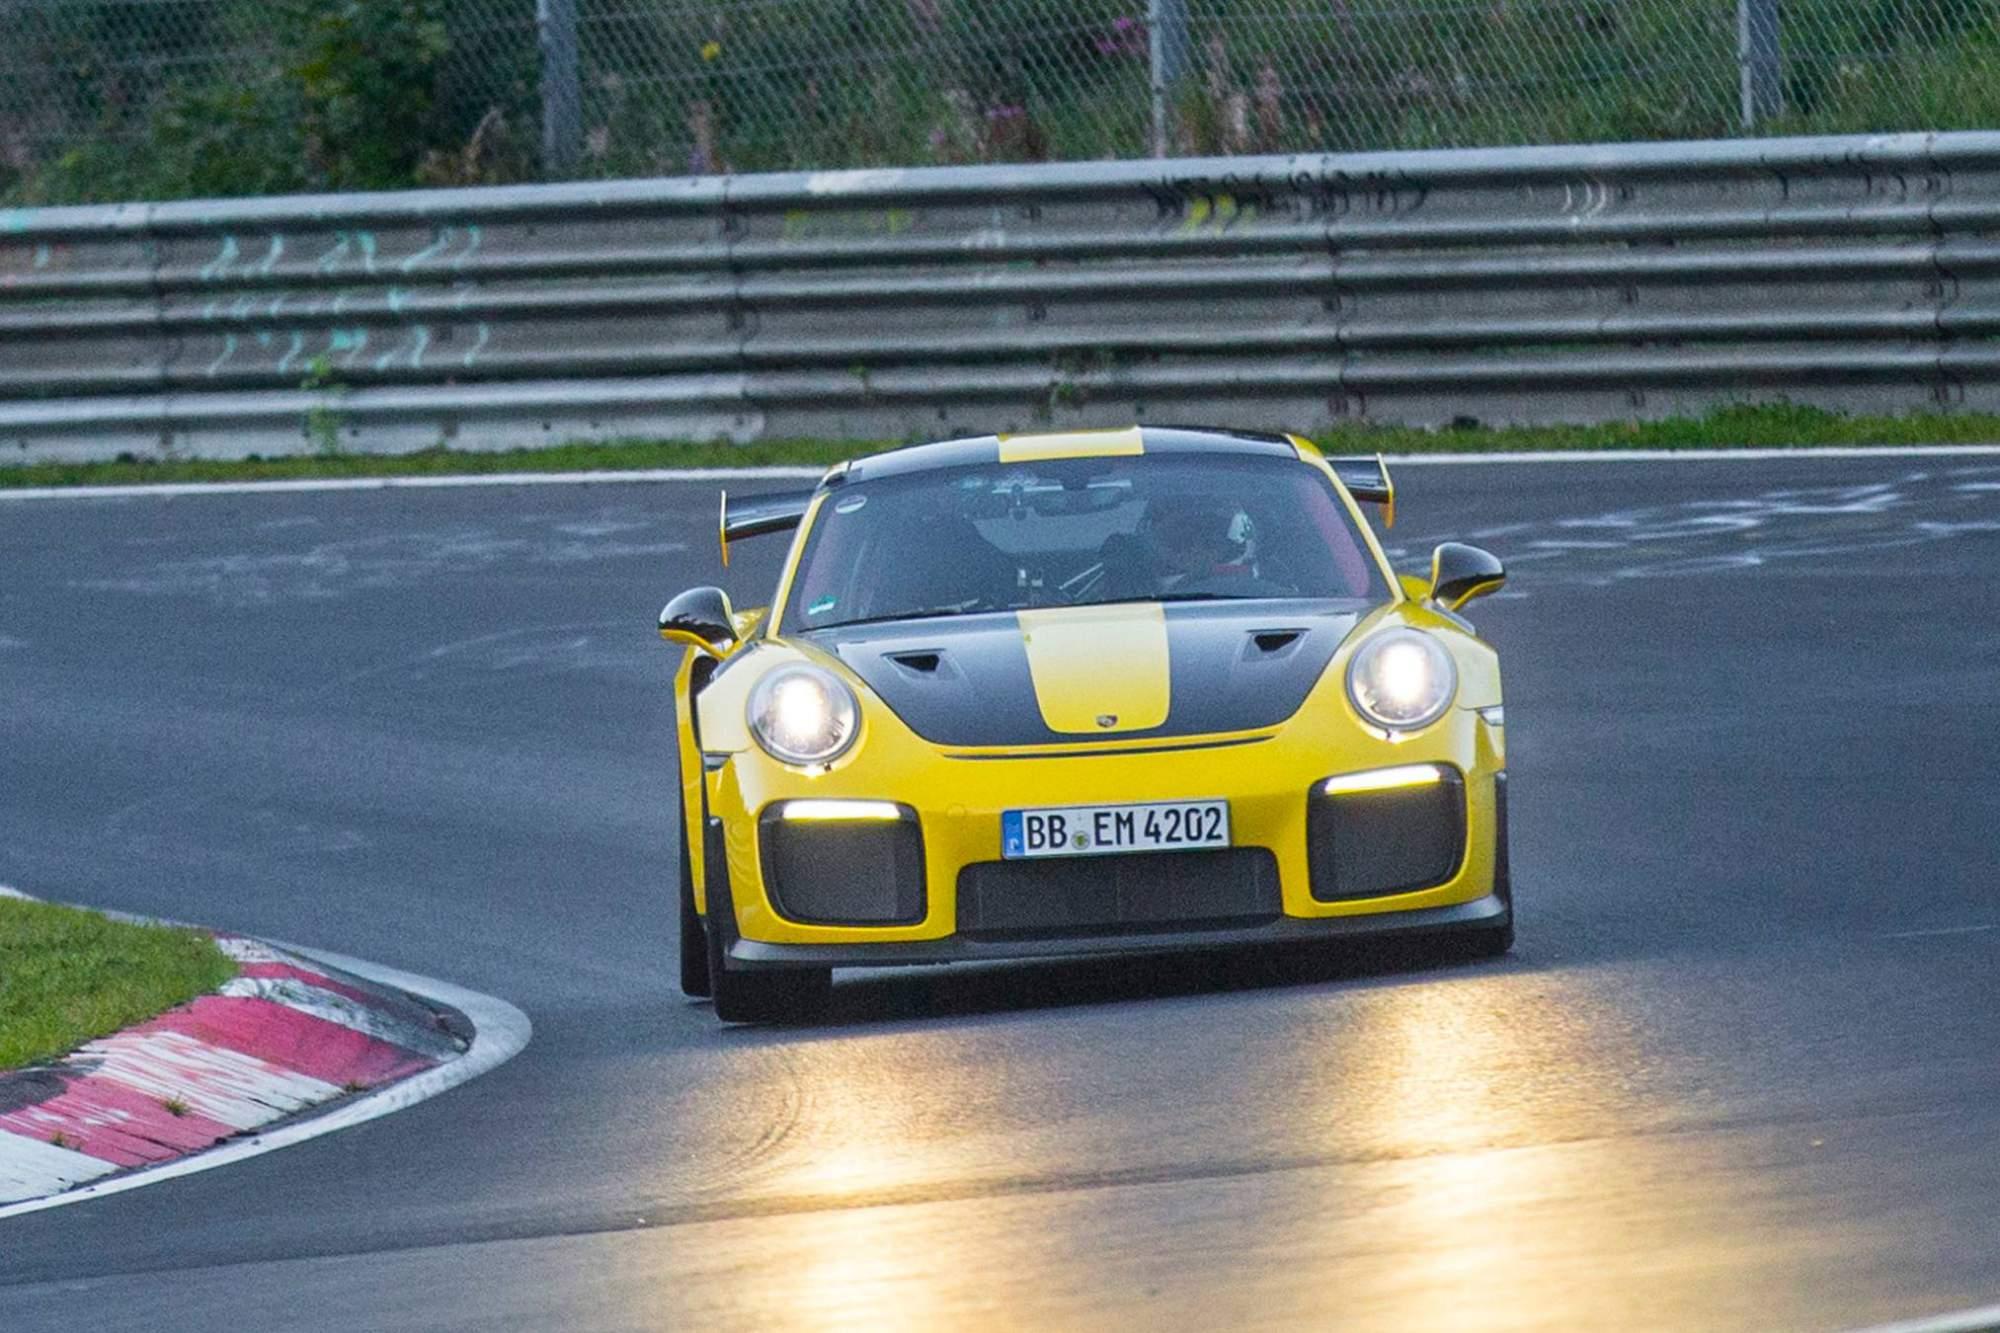 2018-Porsche-911-GT2-RS-Nurburgring-lap-record-9-2782 Interesting Porsche 911 Gt2 Rs Nurburgring Lap Cars Trend